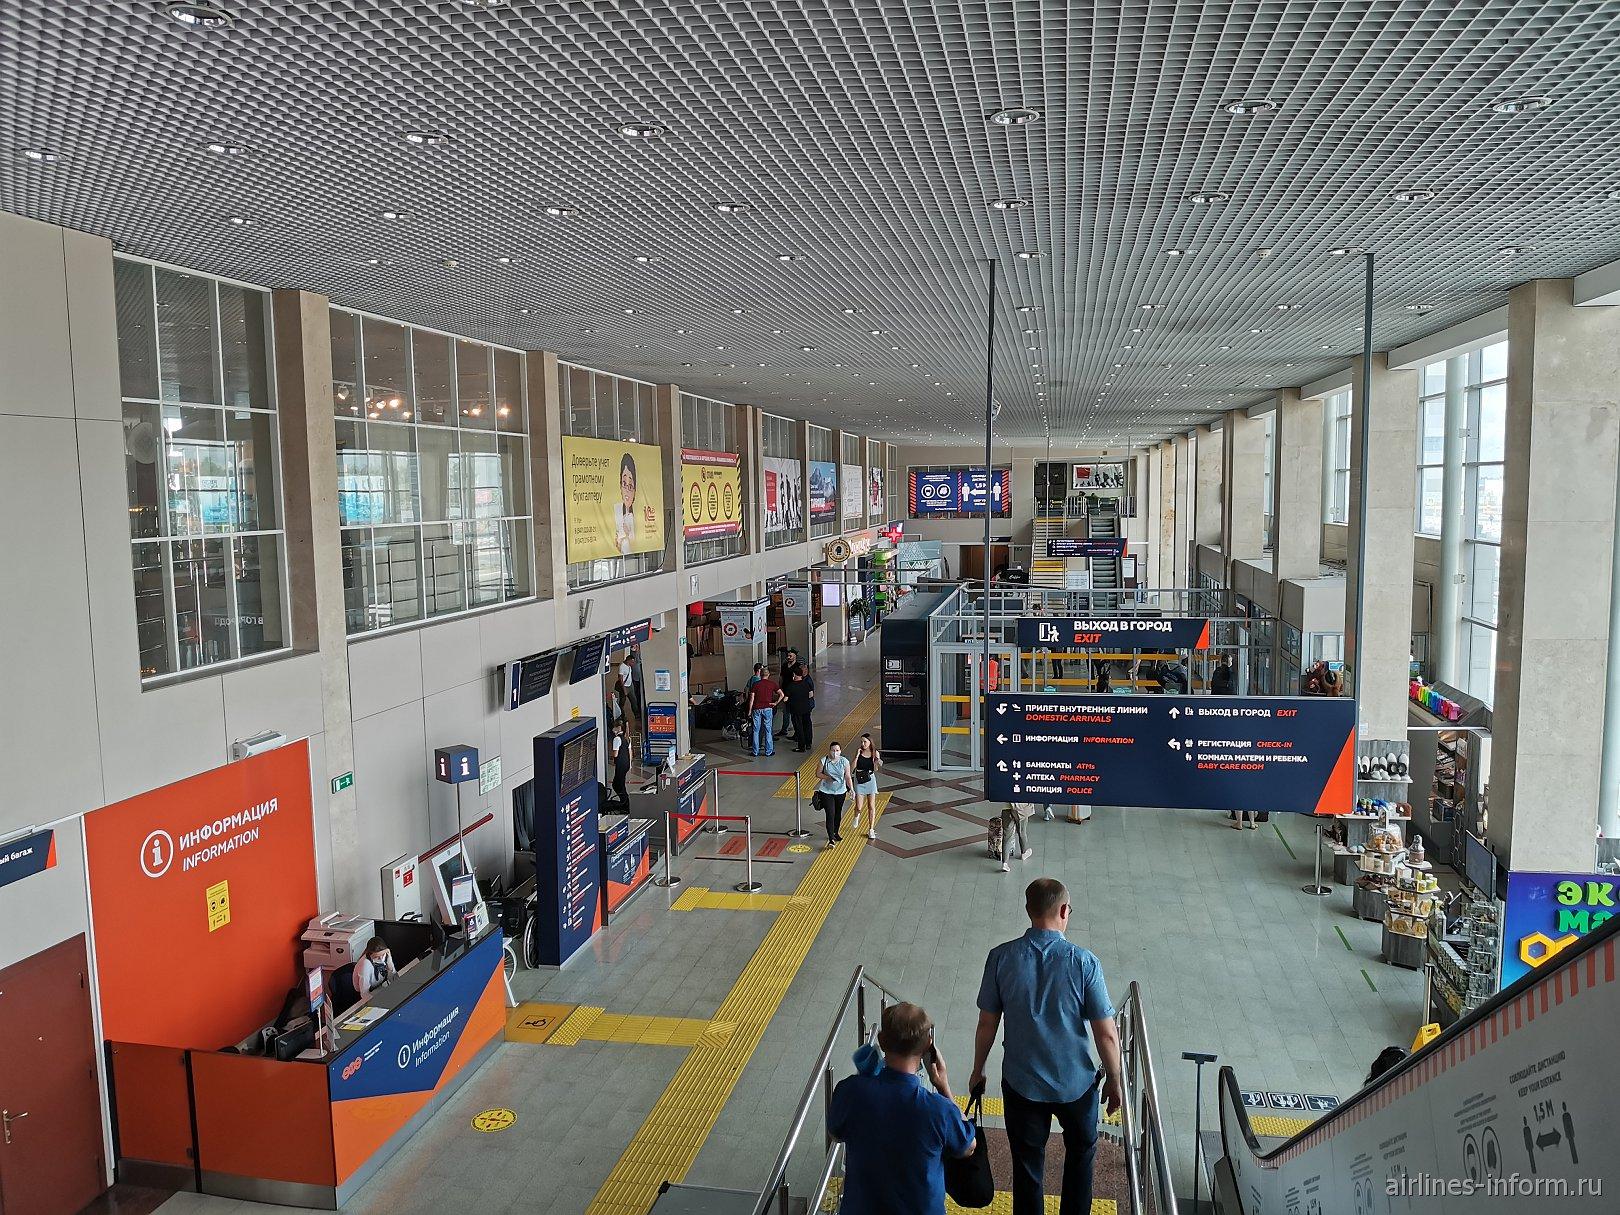 Внутри пассажирского терминала аэропорта Уфа